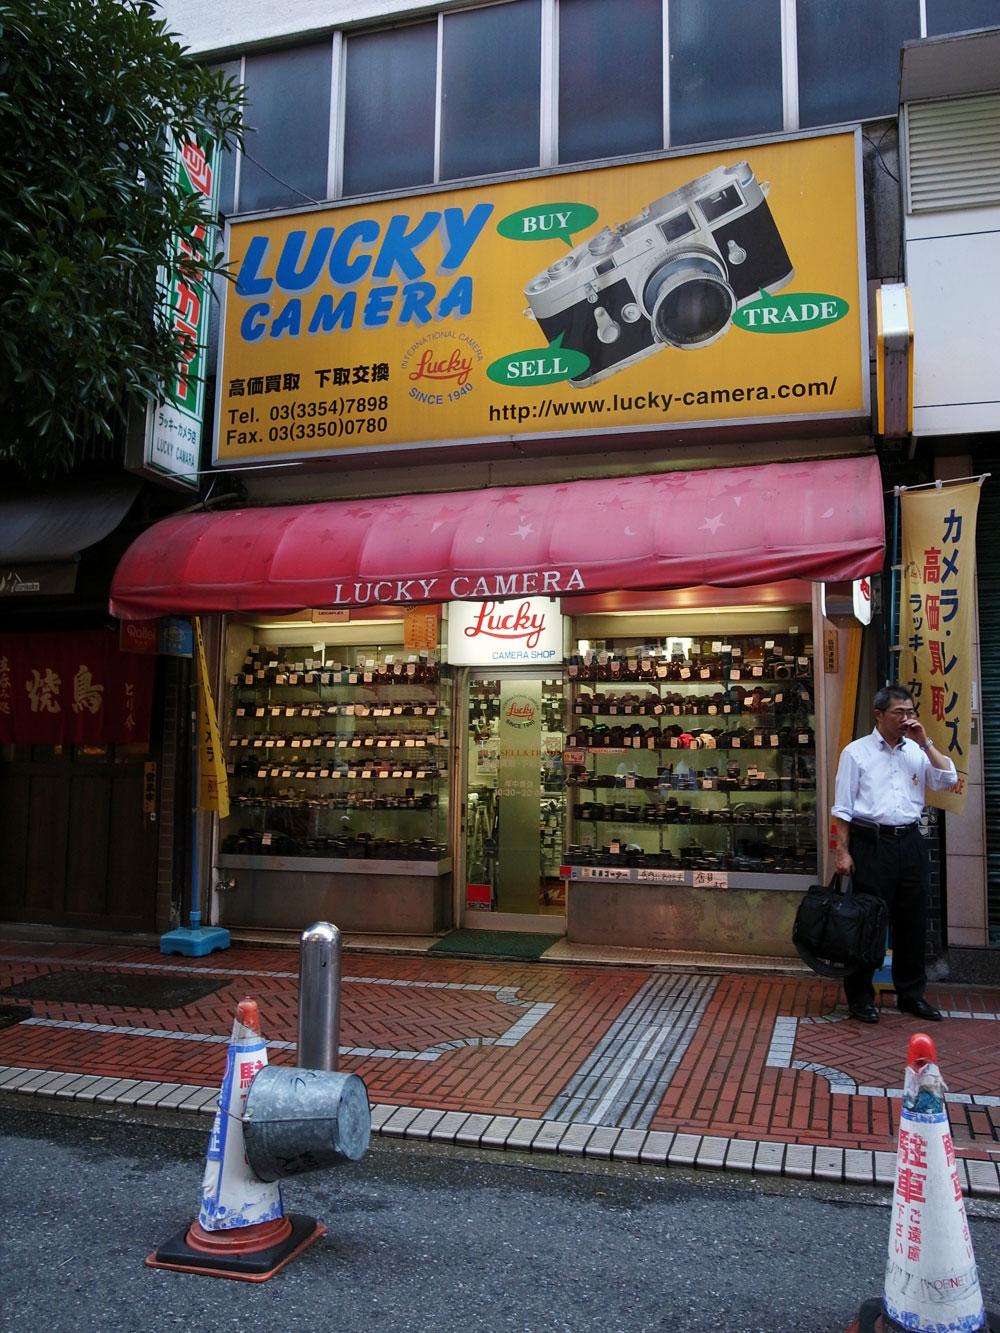 tokyo-camera-style: Lucky Camera in Shinjuku, Tokyo.